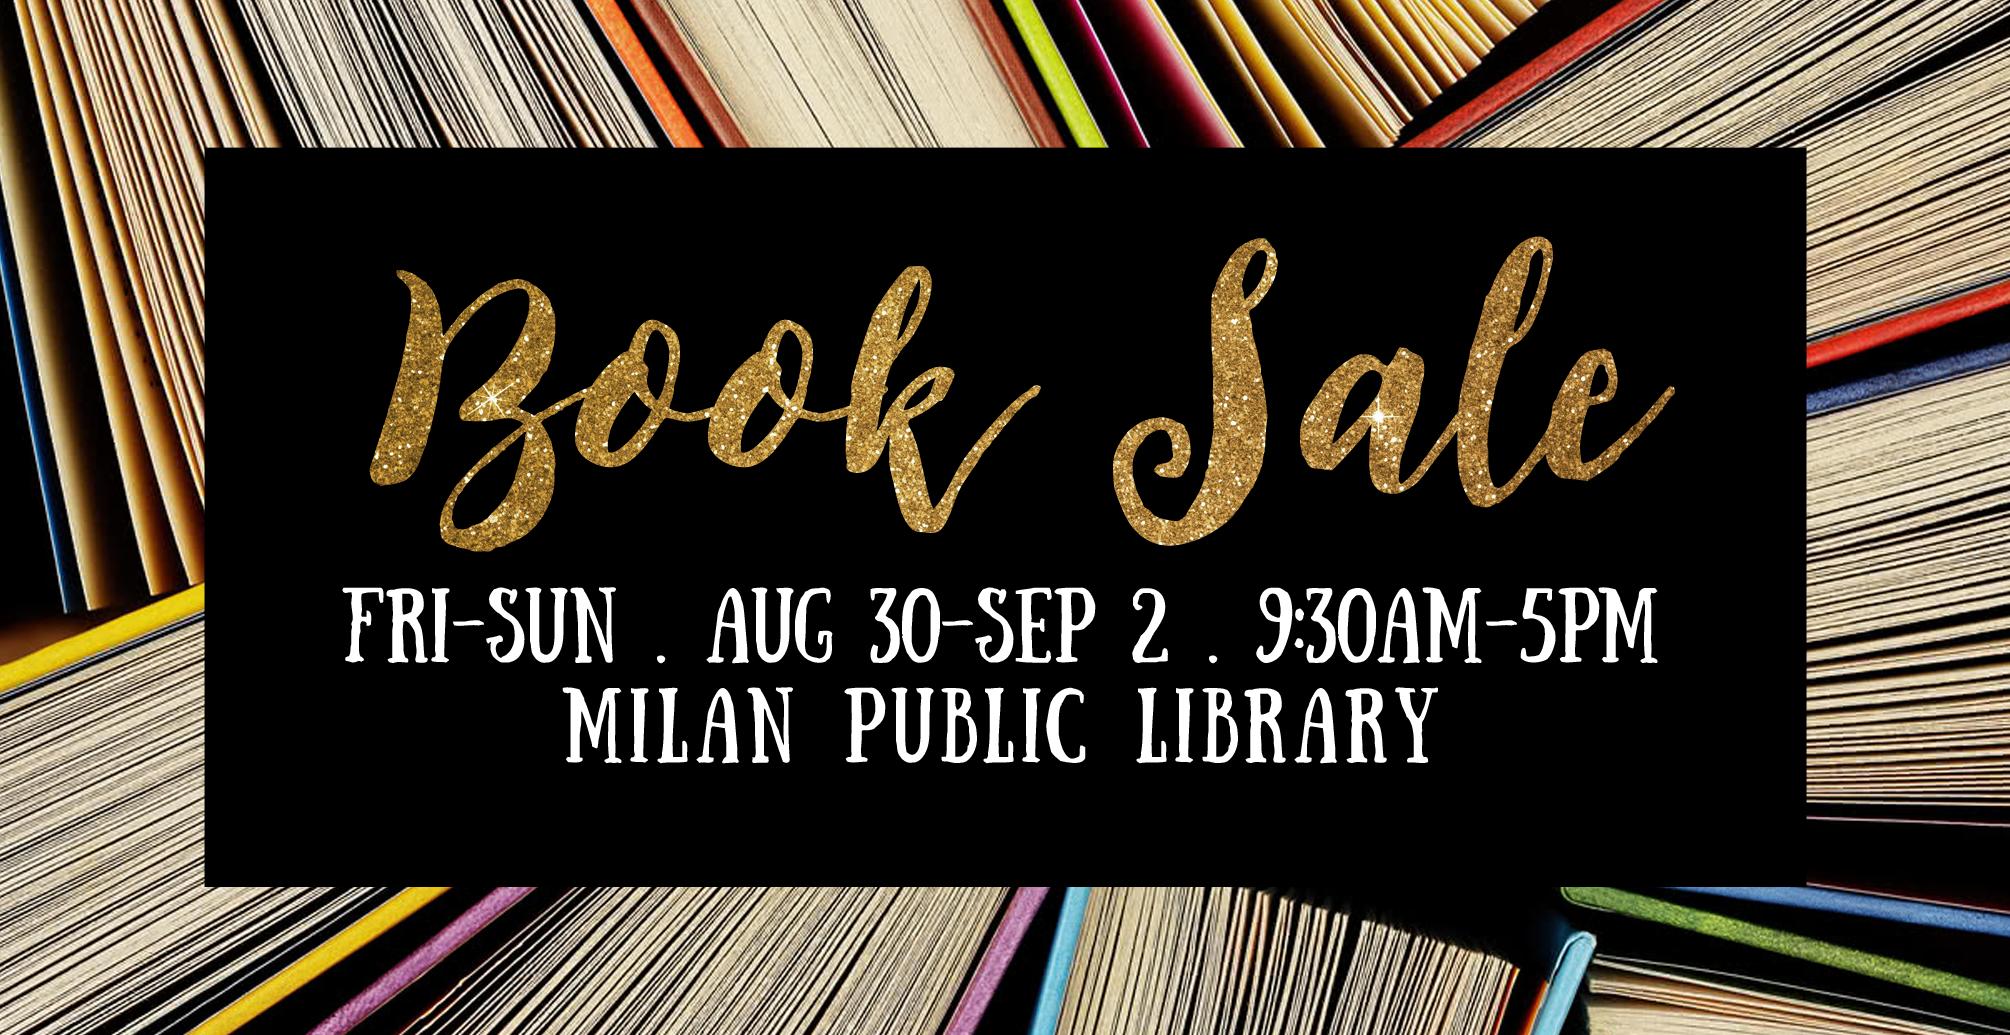 2018-08-LIBRARY-Milan-Book-Sale-Slide